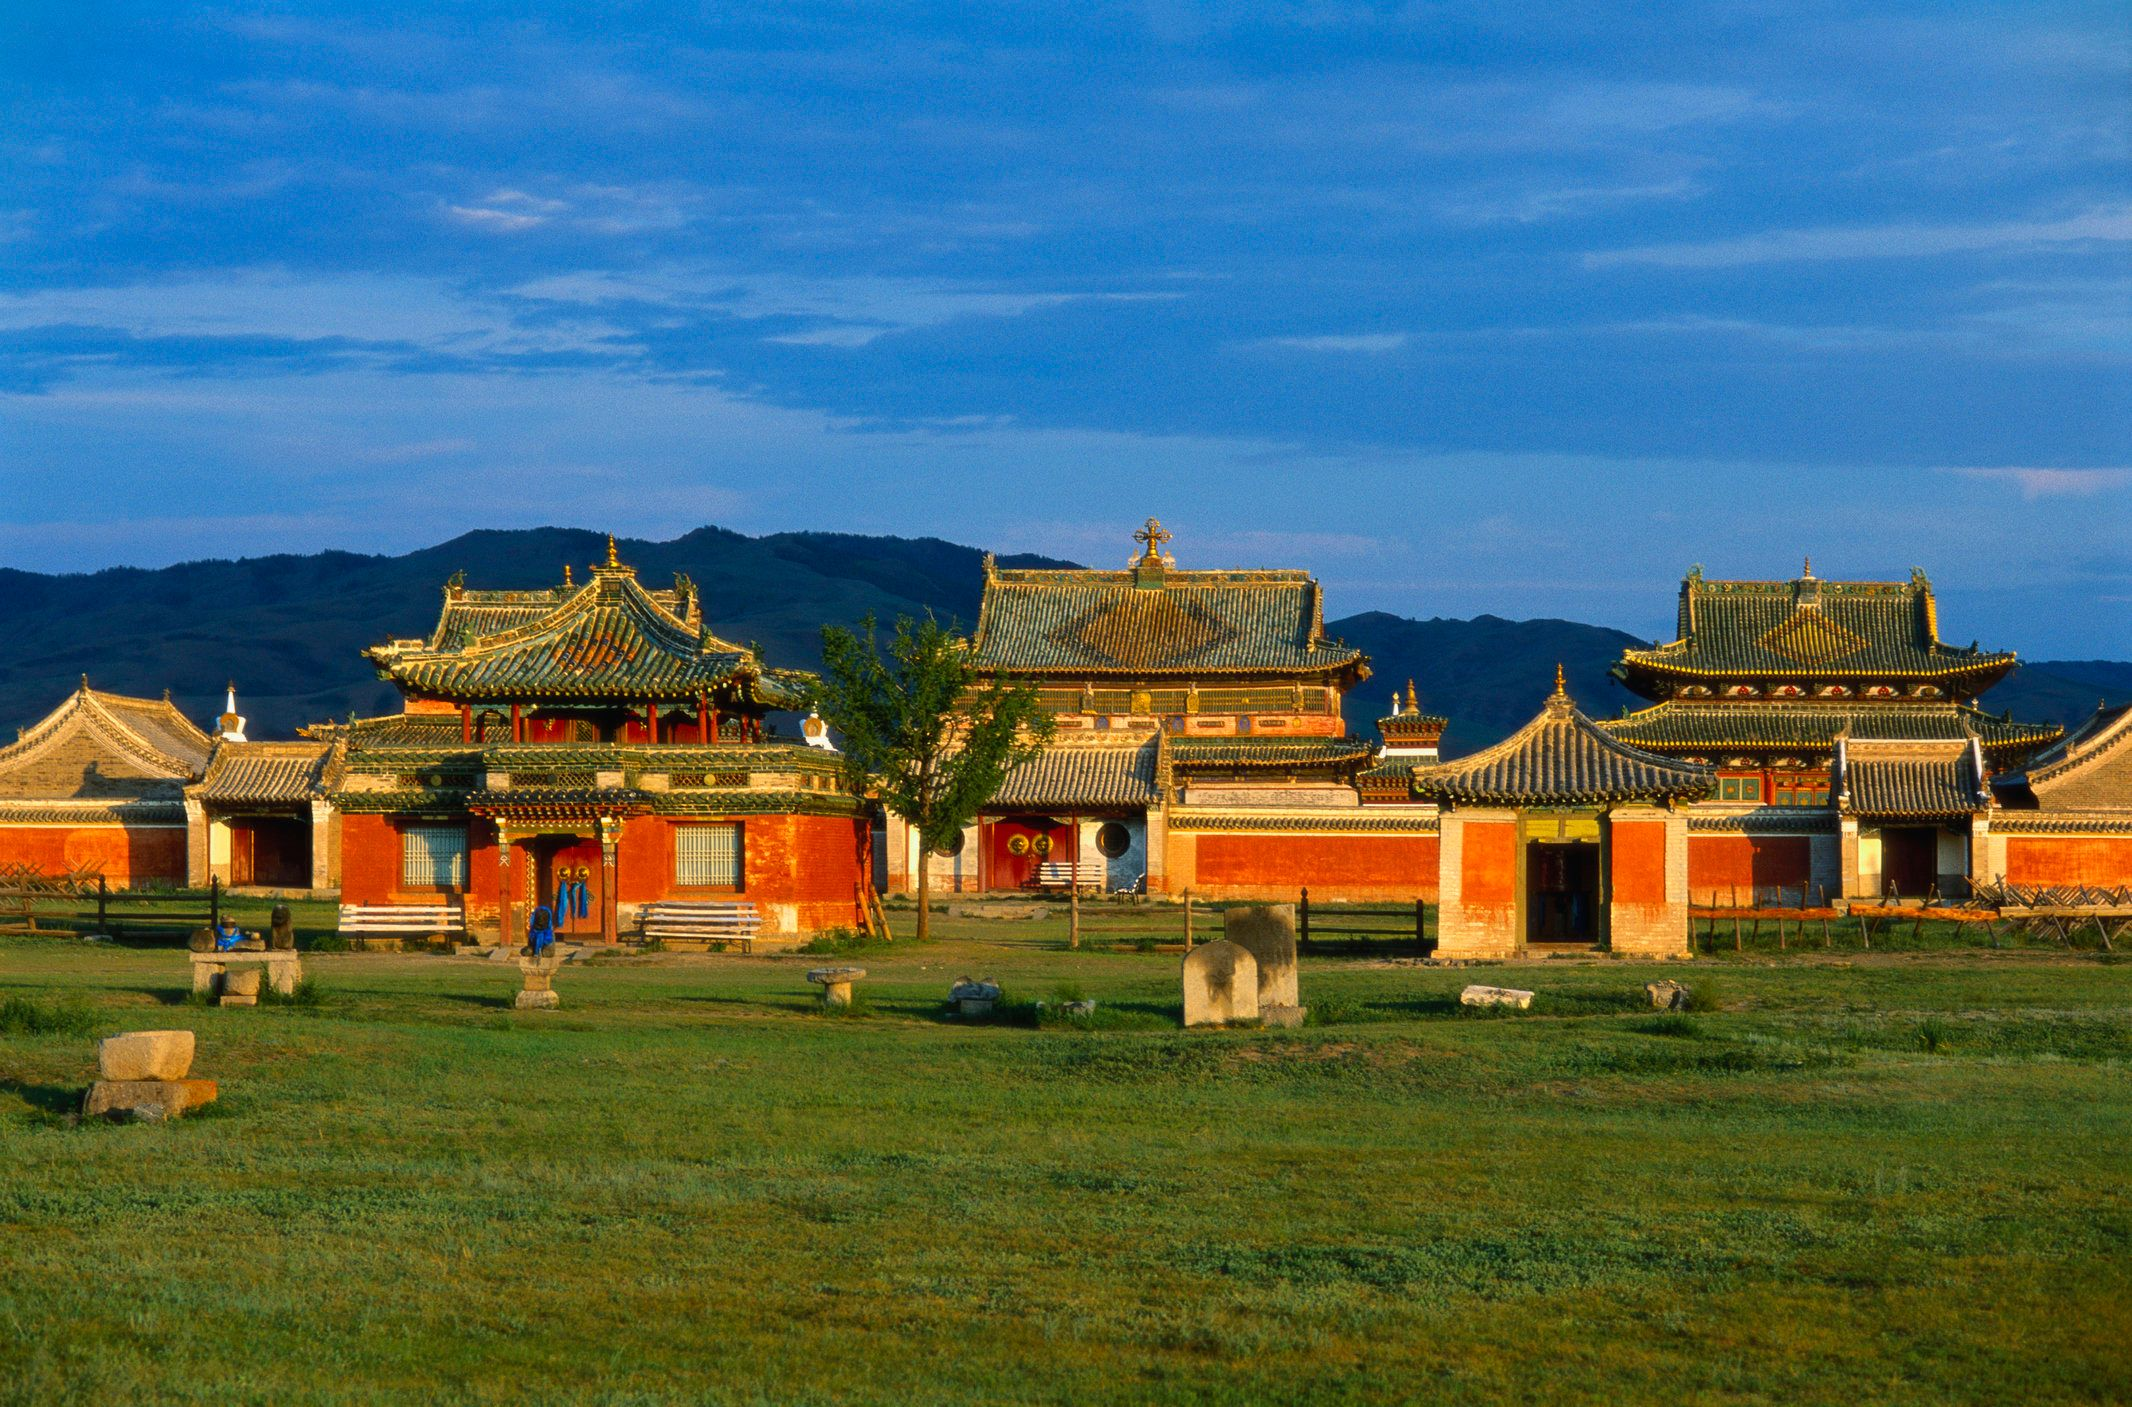 Erdene Zuu Monastery, Karakorum, Uvurkhangai, Mongolia